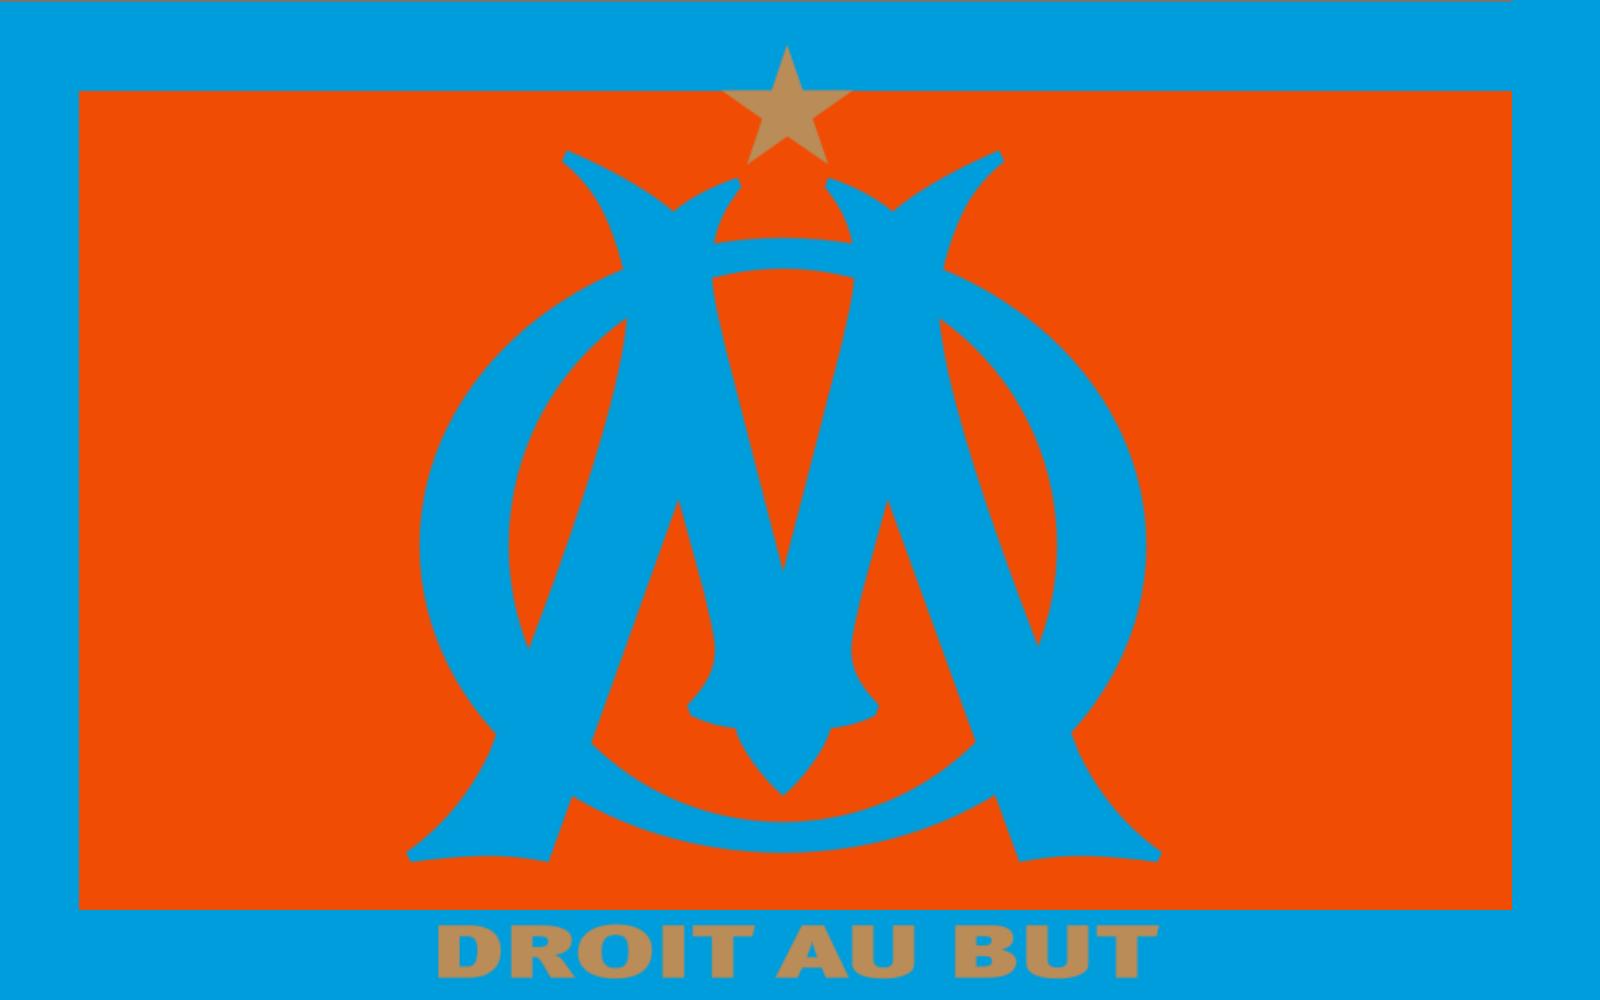 Old school panini osp rfc league saison 4 olympique - Logo de l olympique de marseille ...